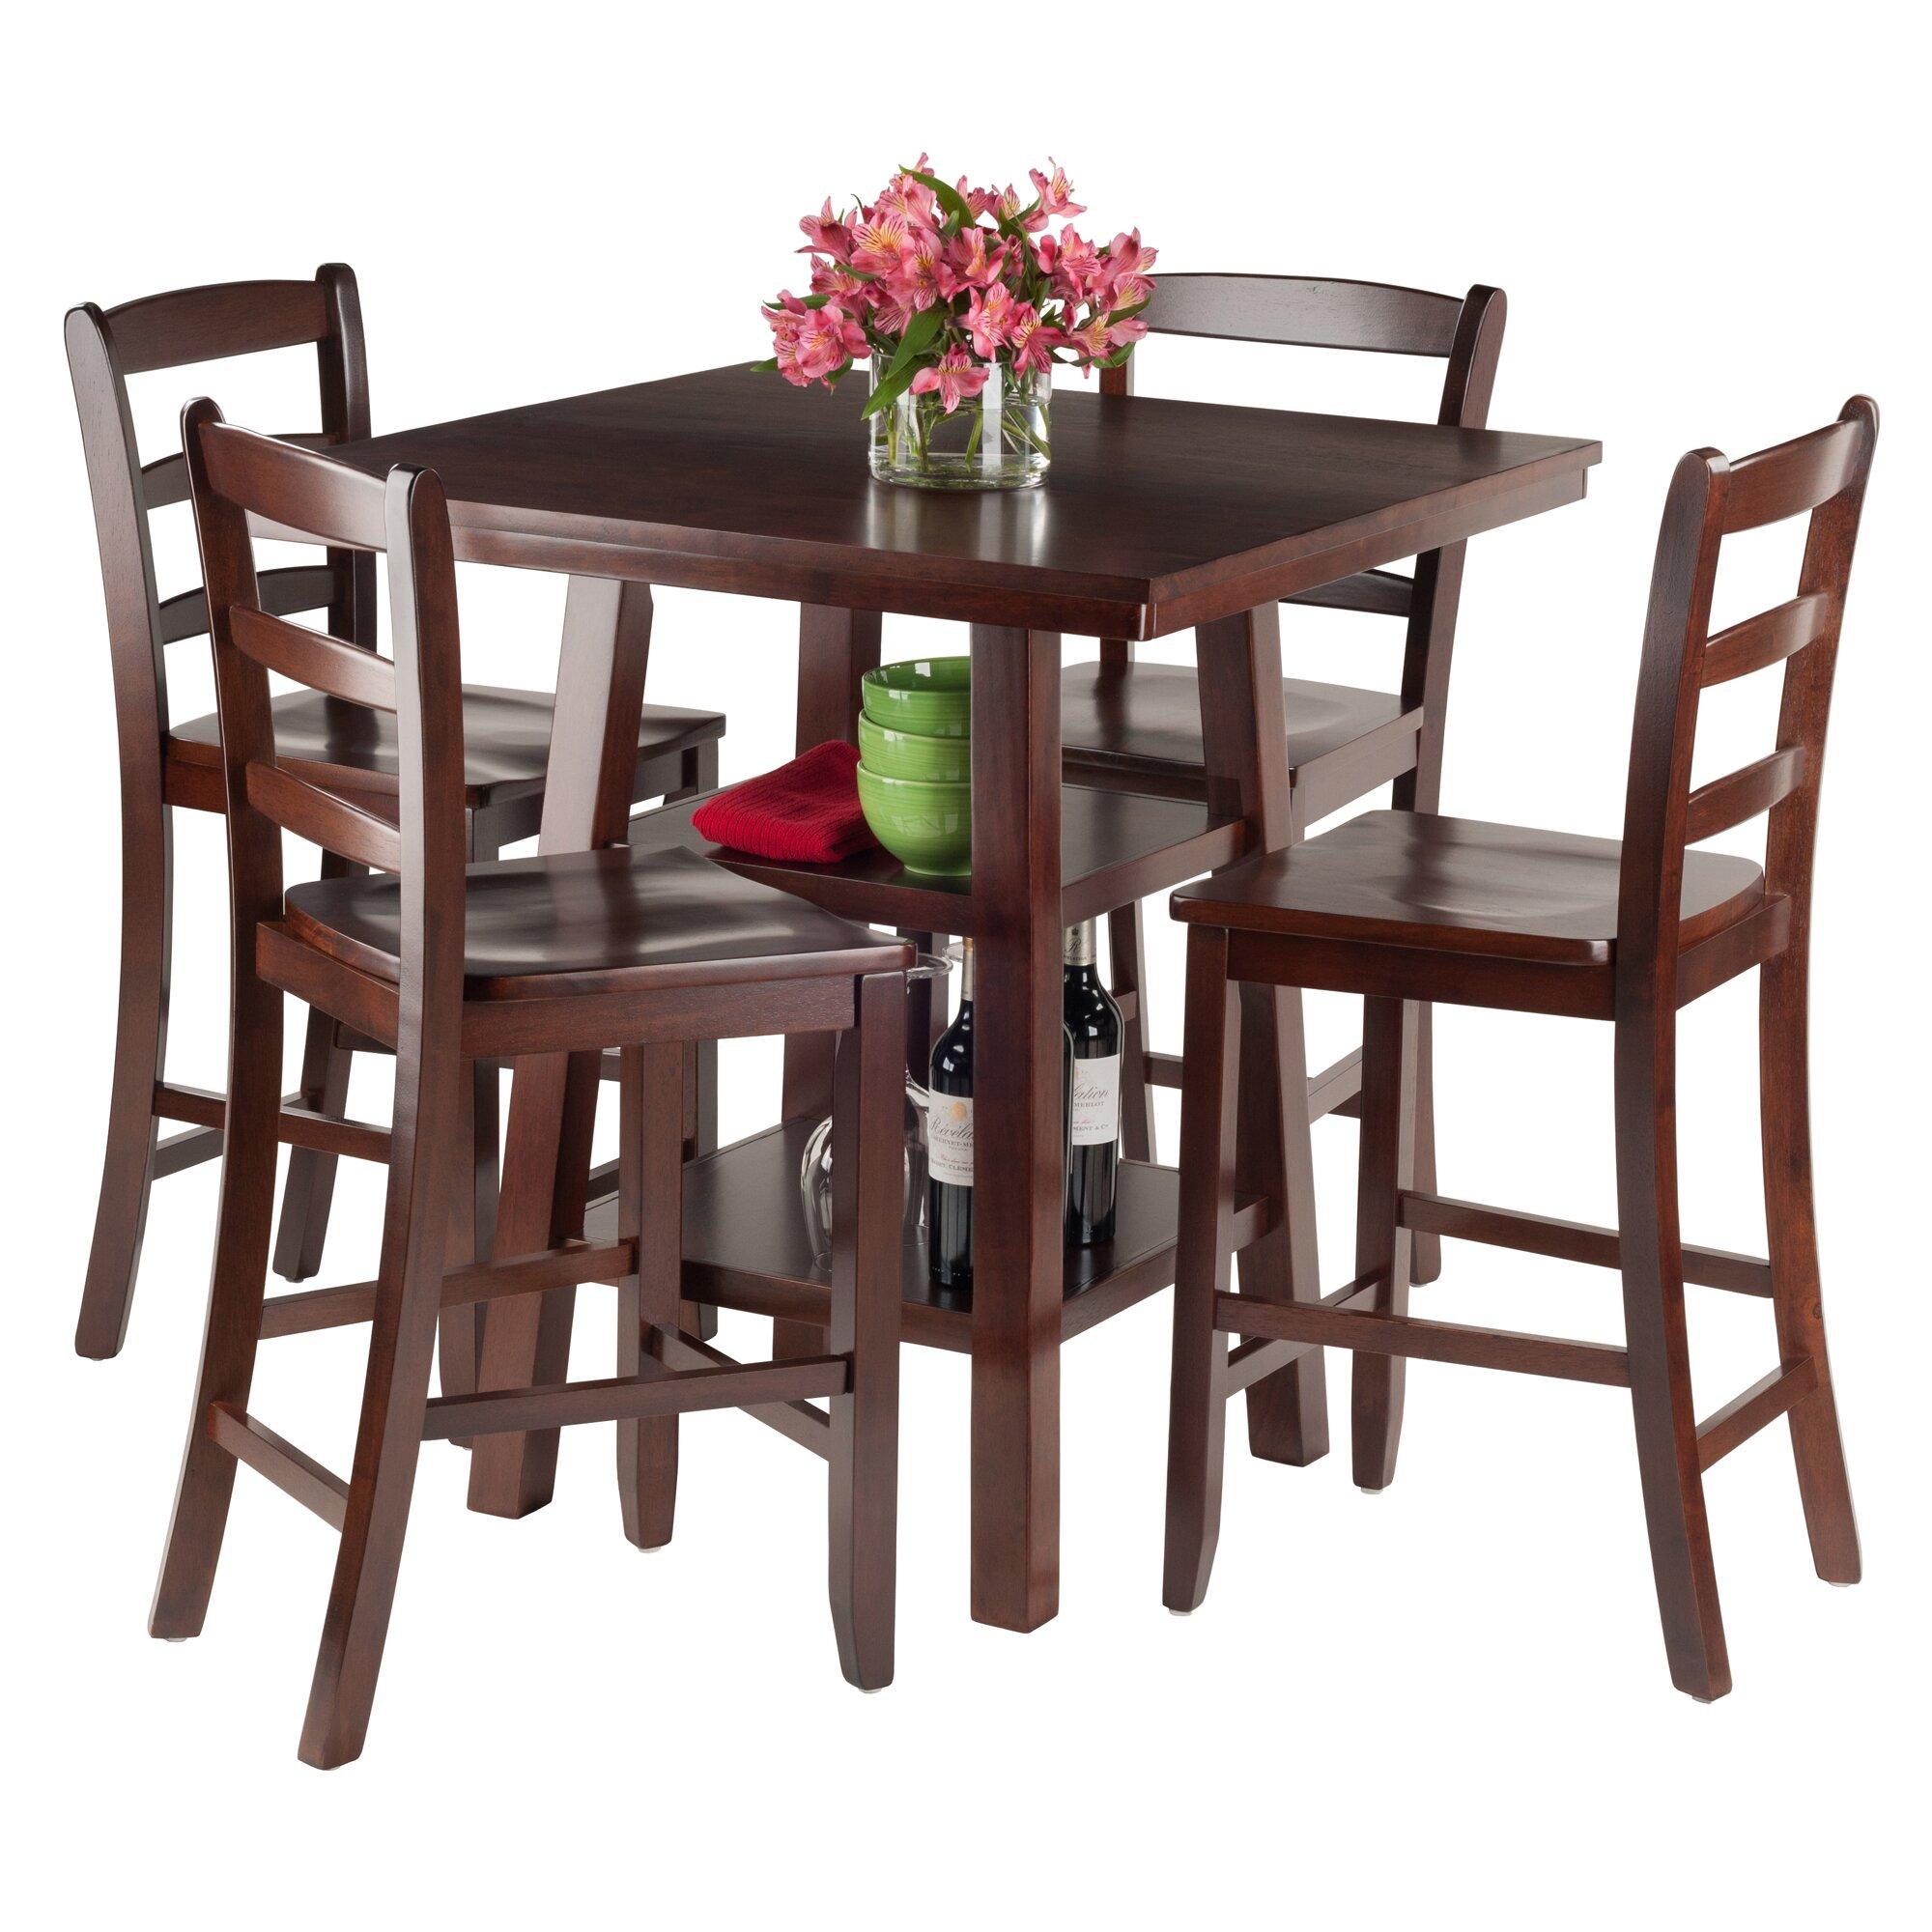 luxury home orlando 5 piece pub table set wayfair. Black Bedroom Furniture Sets. Home Design Ideas